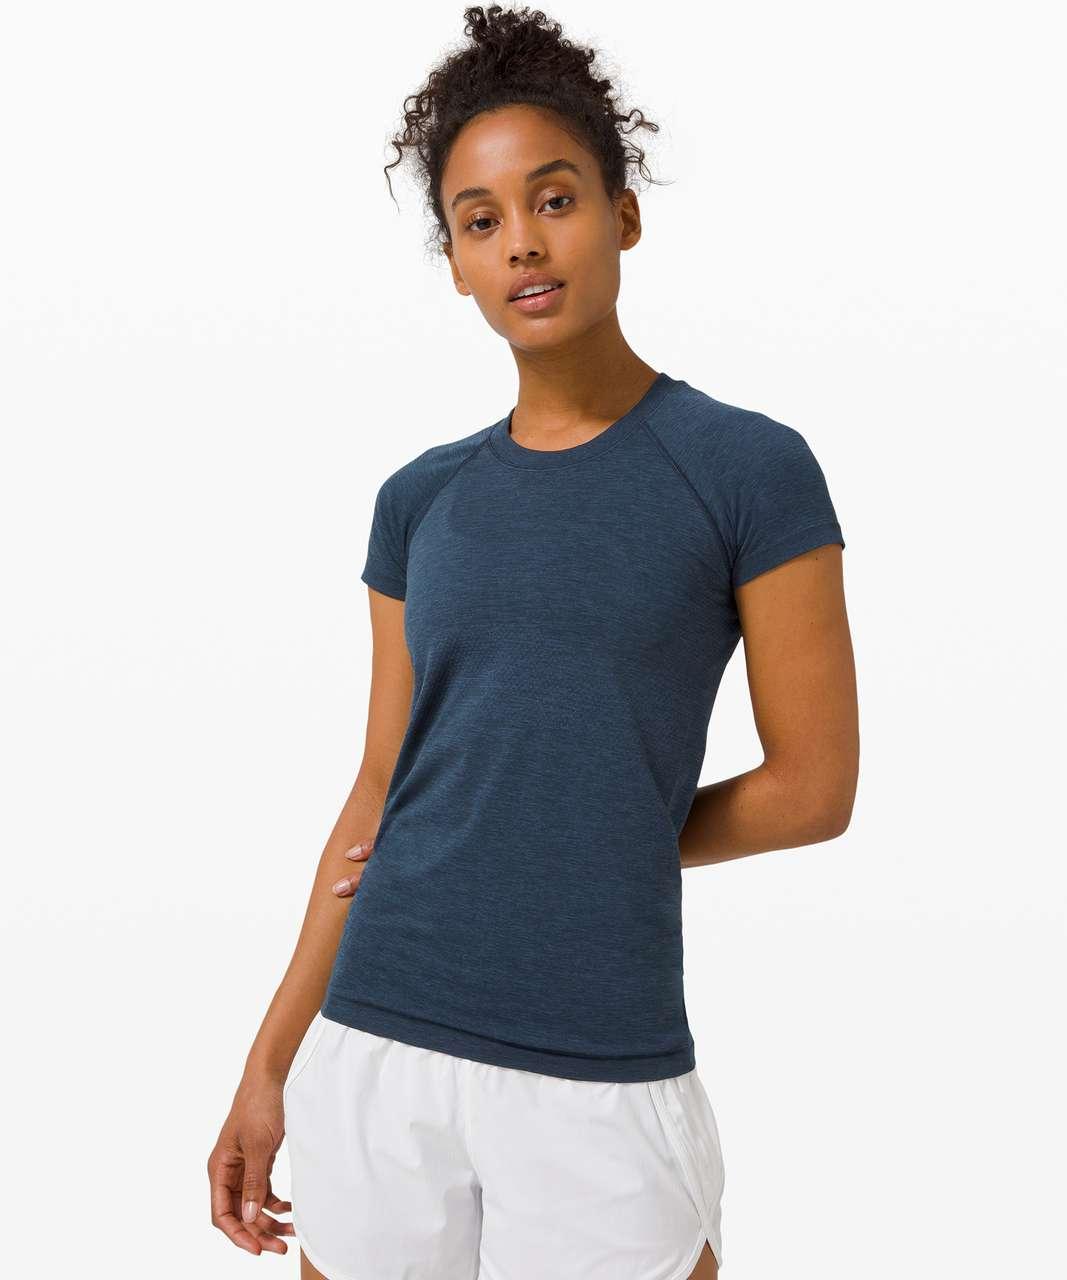 Lululemon Swiftly Tech Short Sleeve 2.0 - Ink Blue / True Navy